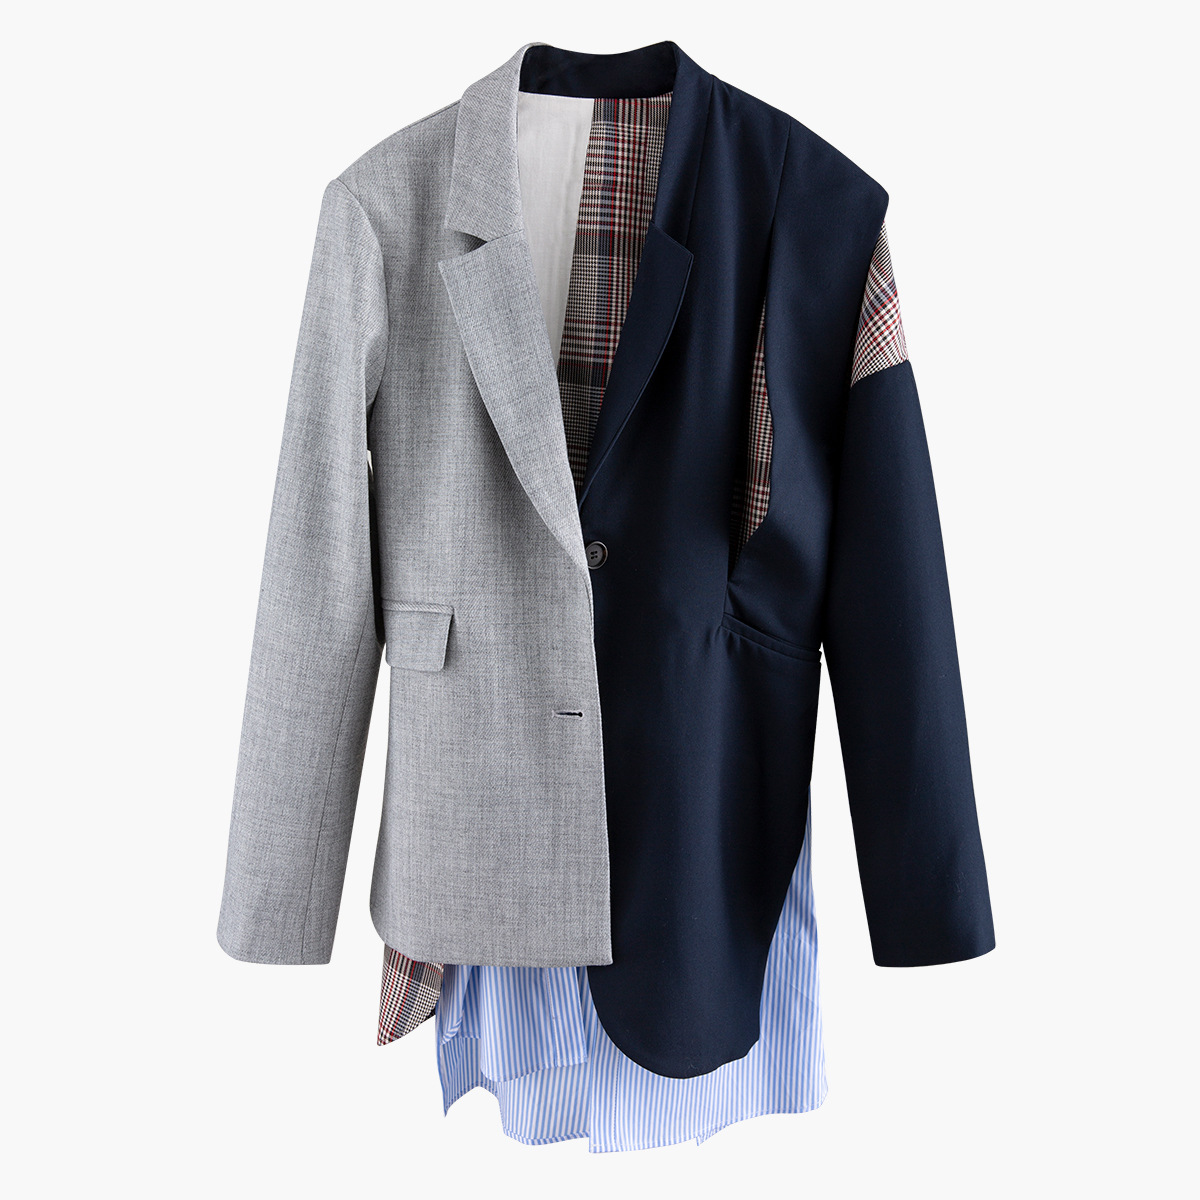 IHOBBY Women Spring Patchwork Blazers Fashion New Irregular Long Sleeve Hit Color Blazer Female Top Coat